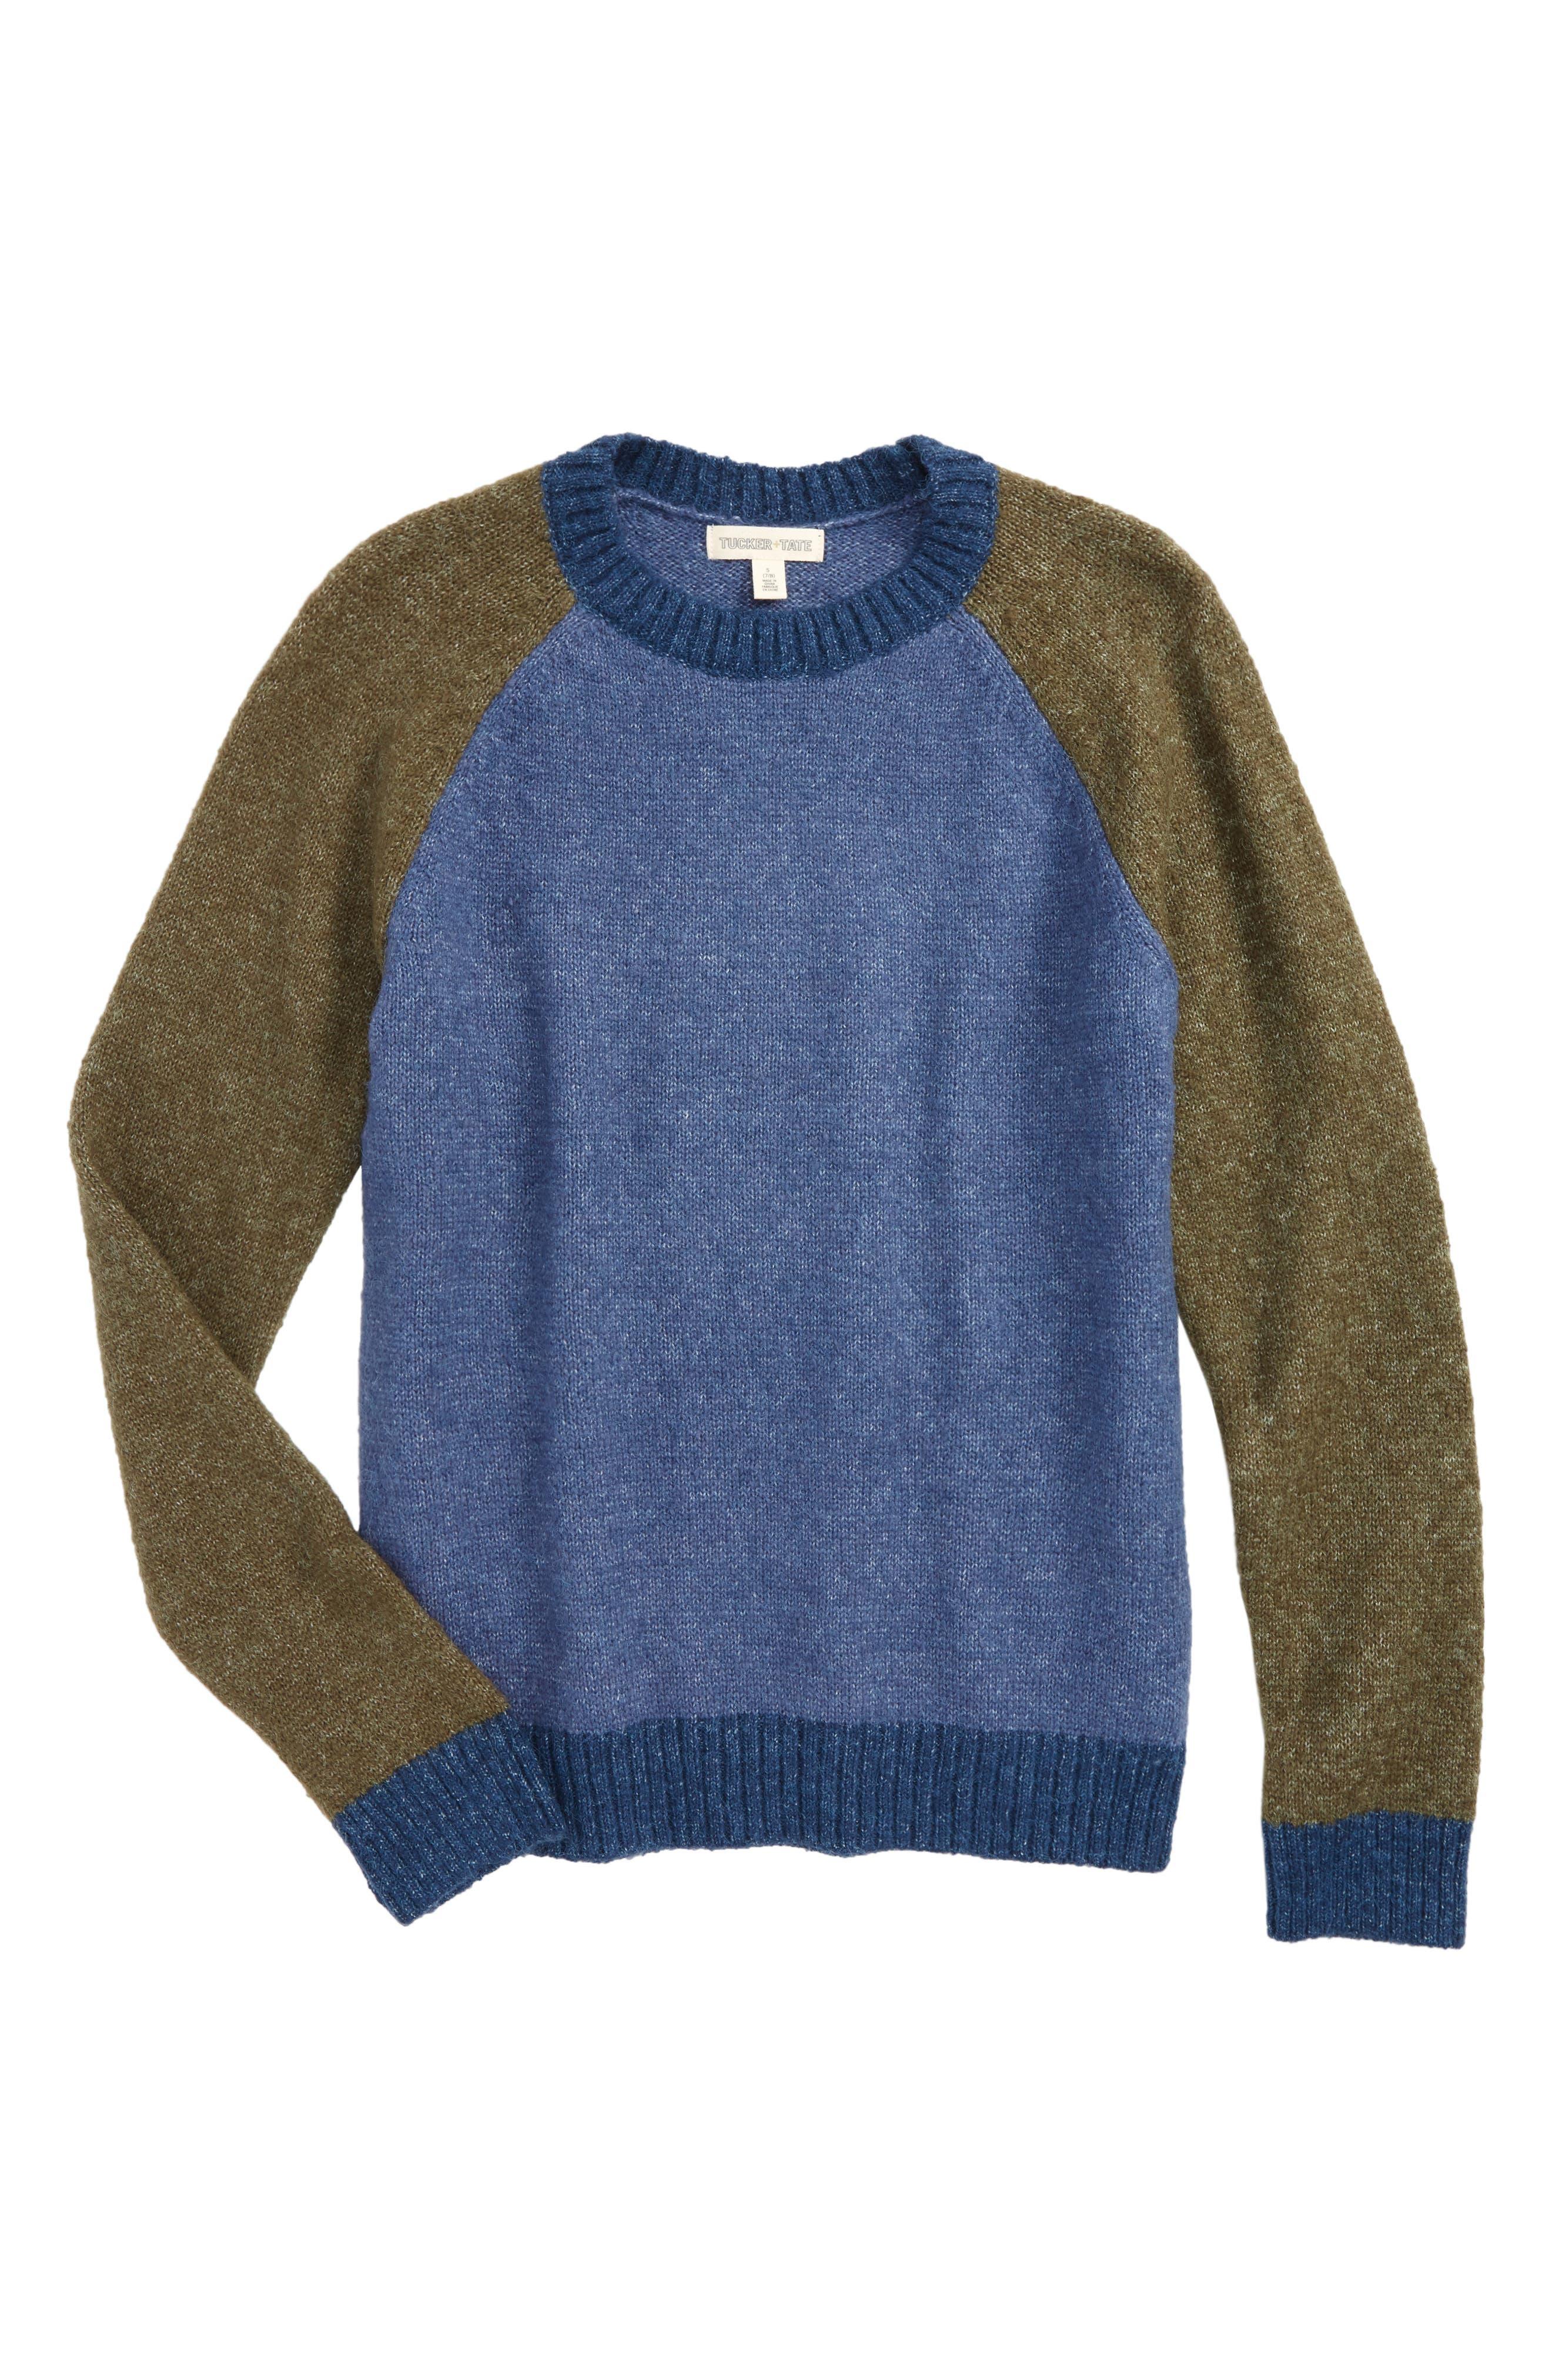 Main Image - Tucker + Tate Colorblock Knit Sweater (Big Boys)